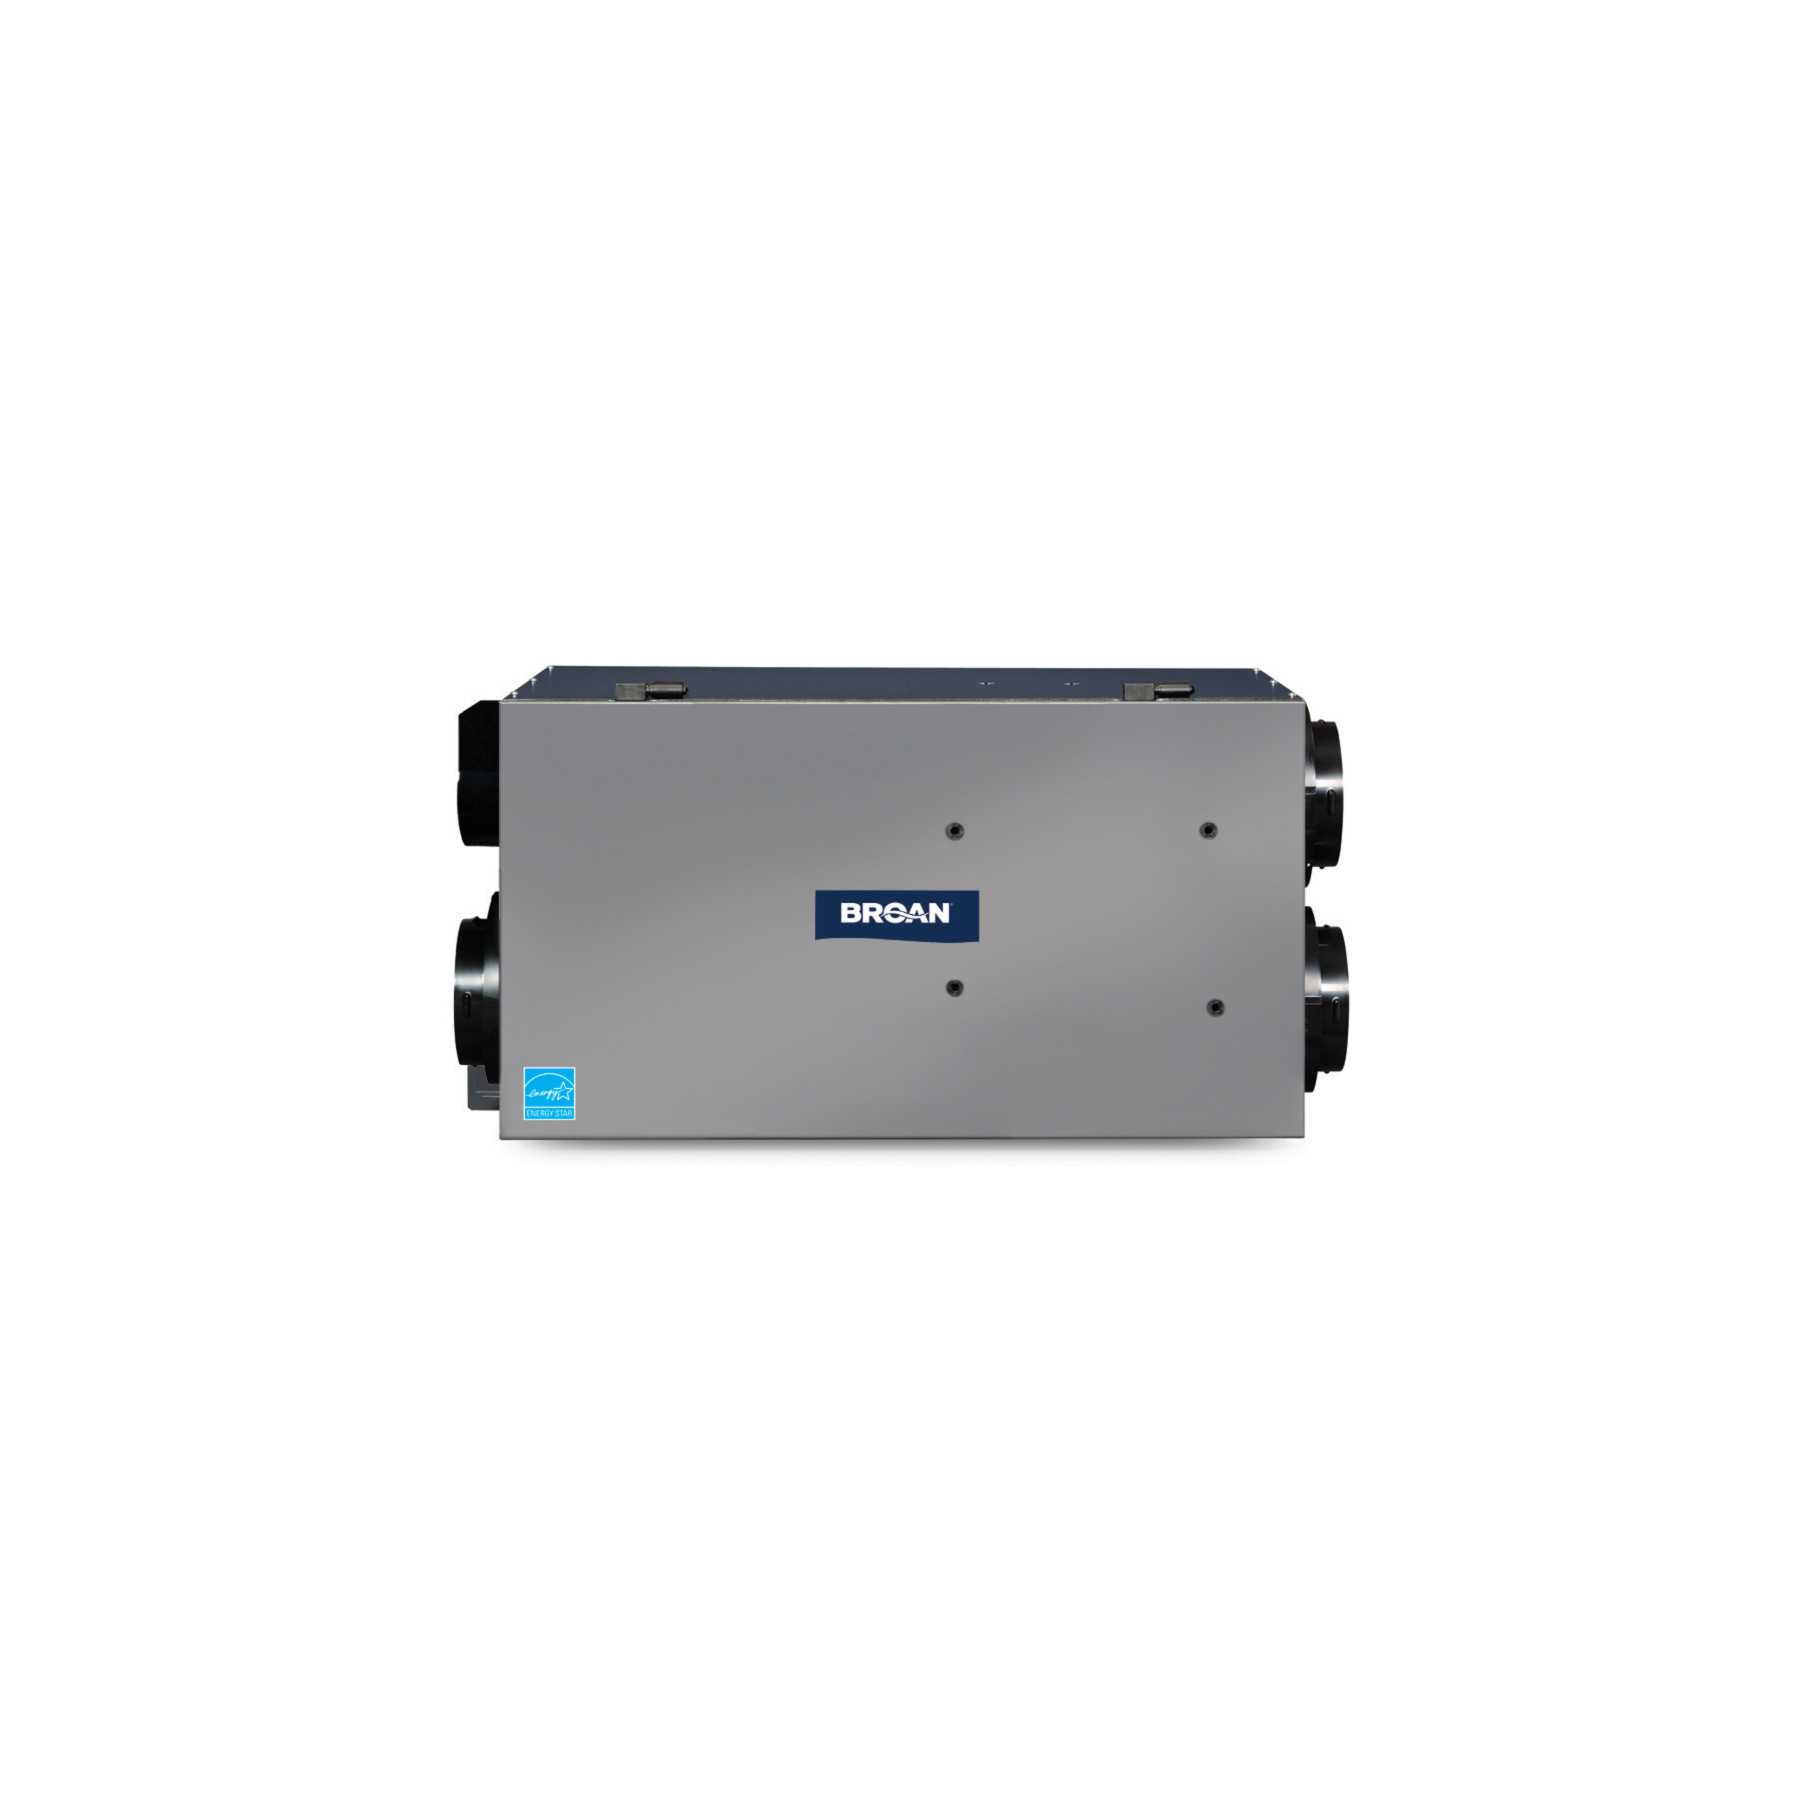 Broan® Advanced Series Heat Recovery Ventilator, 192 CFM at 0.4 in. w.g.